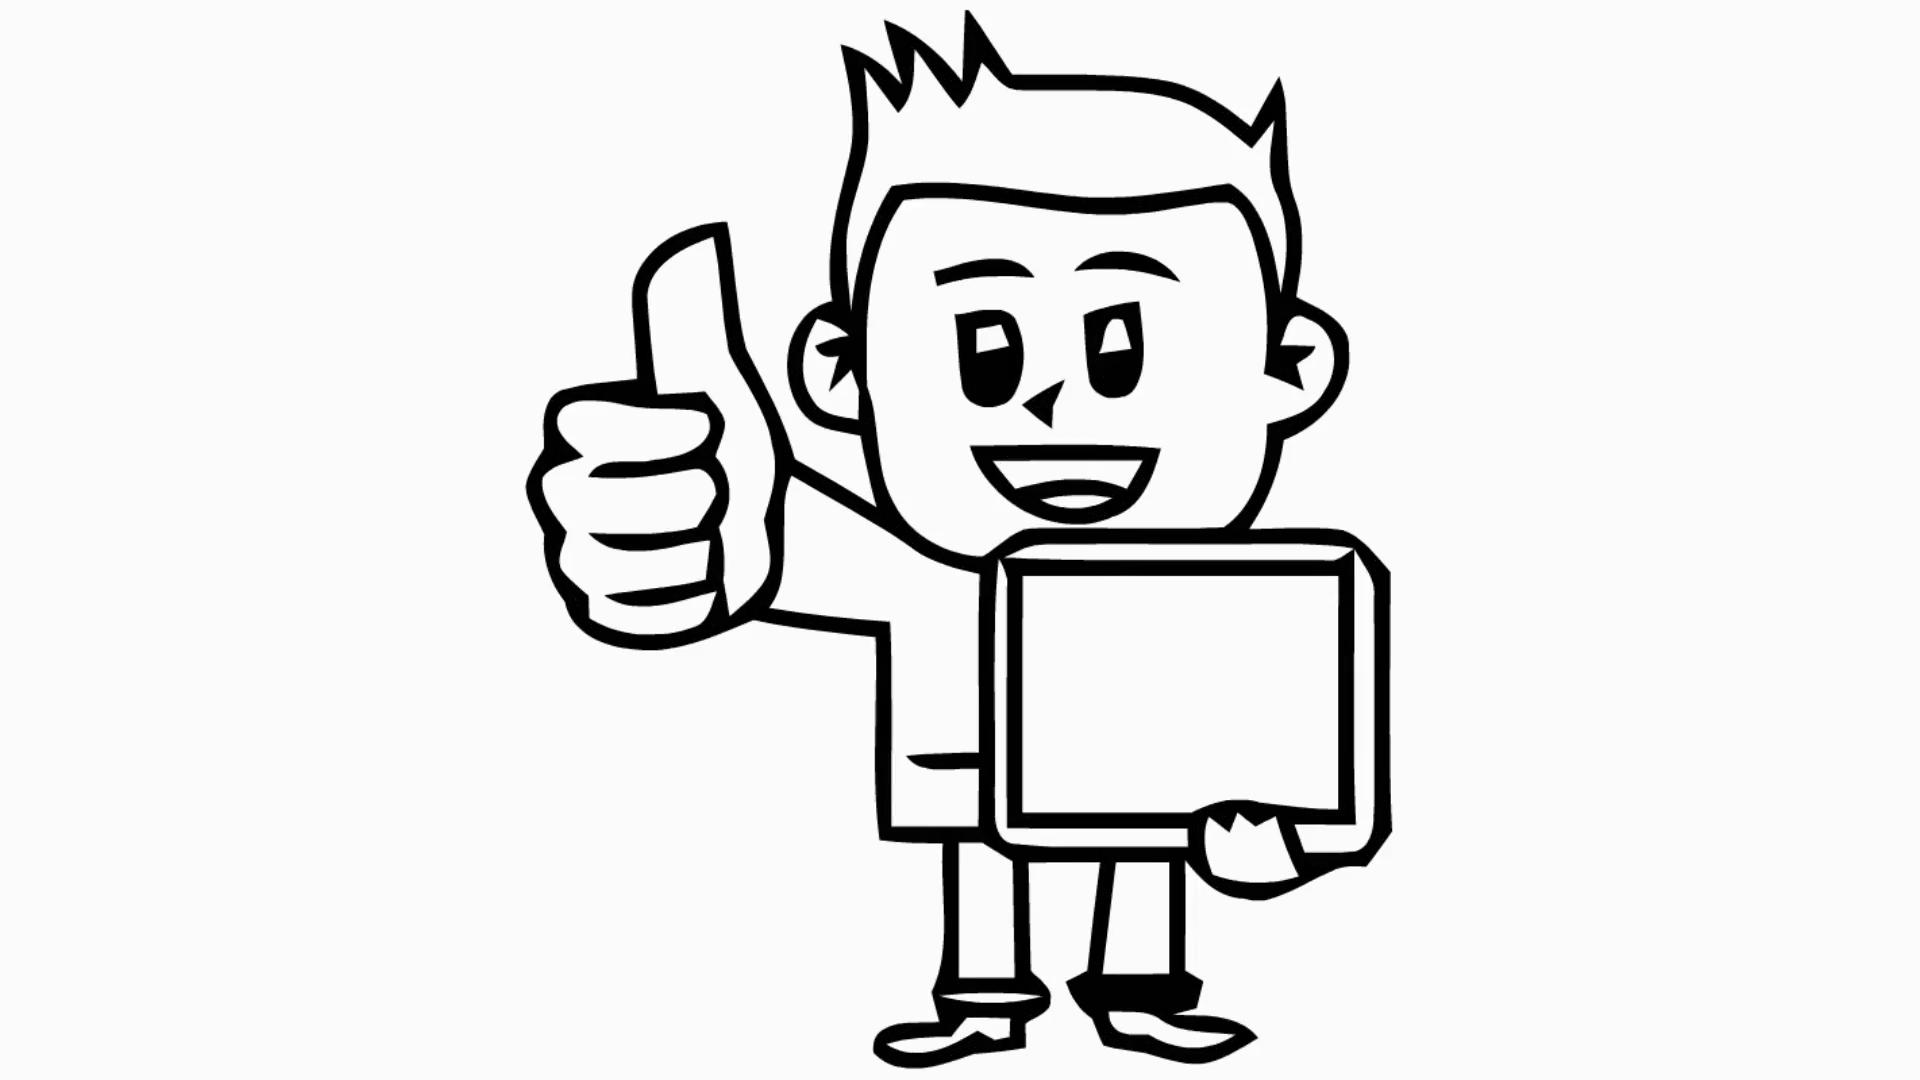 Drawn microphone animated Cartoon transparent hand hand